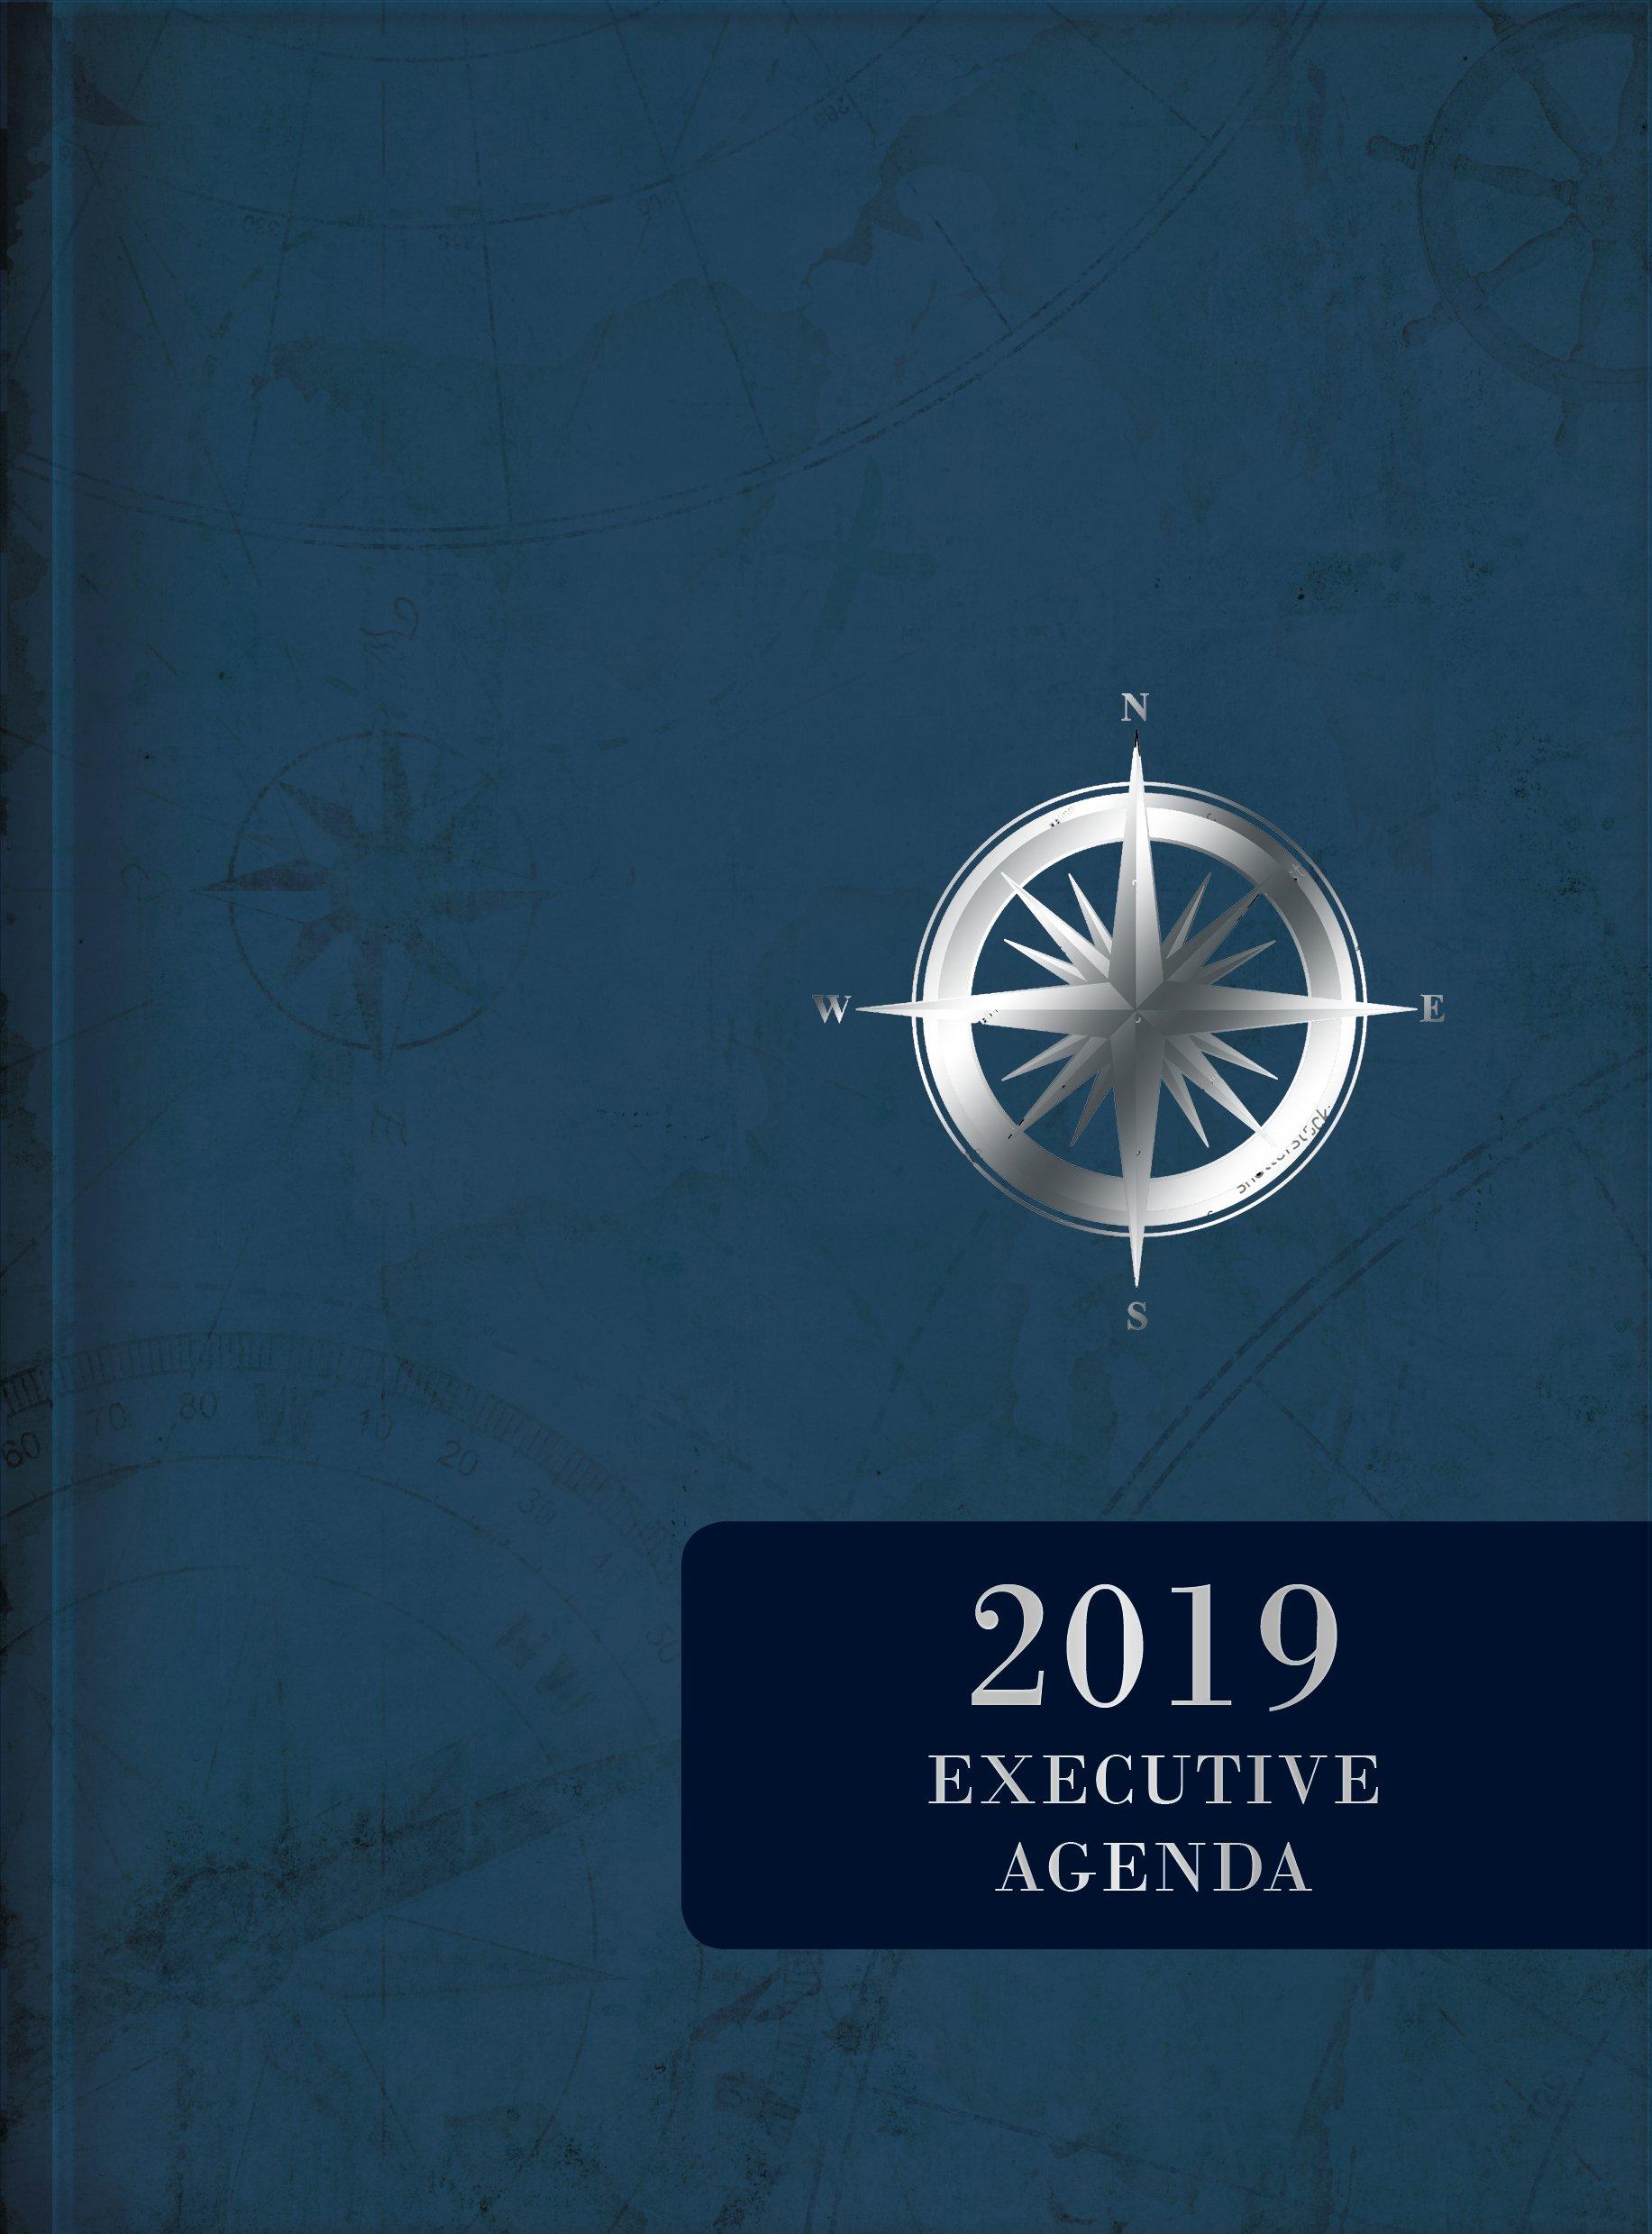 Amazon.com: The Treasure of Wisdom - 2019 Executive Agenda ...